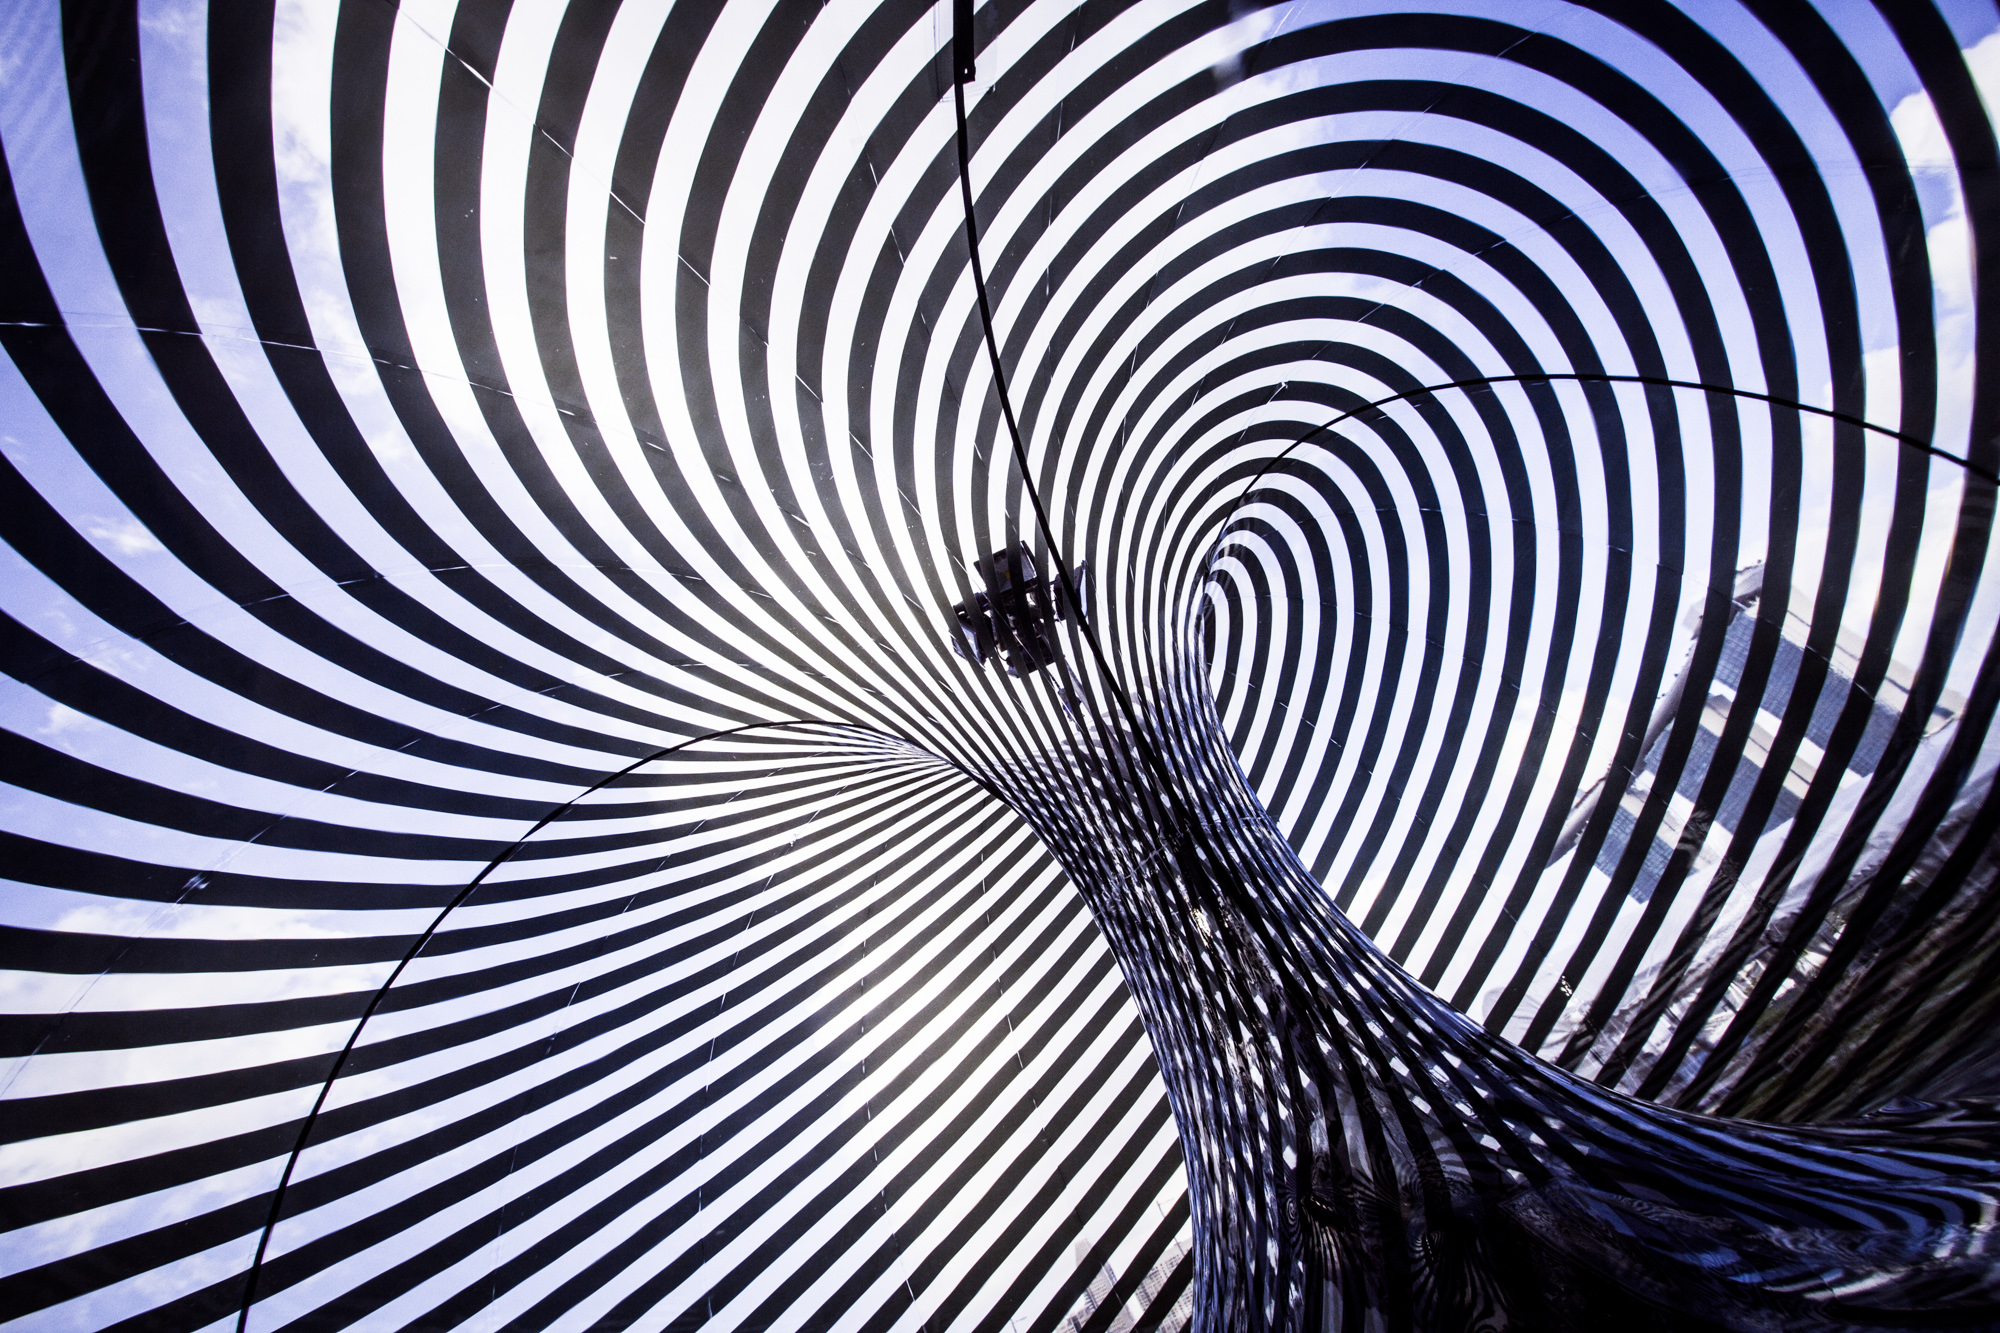 Shadow patterns photo